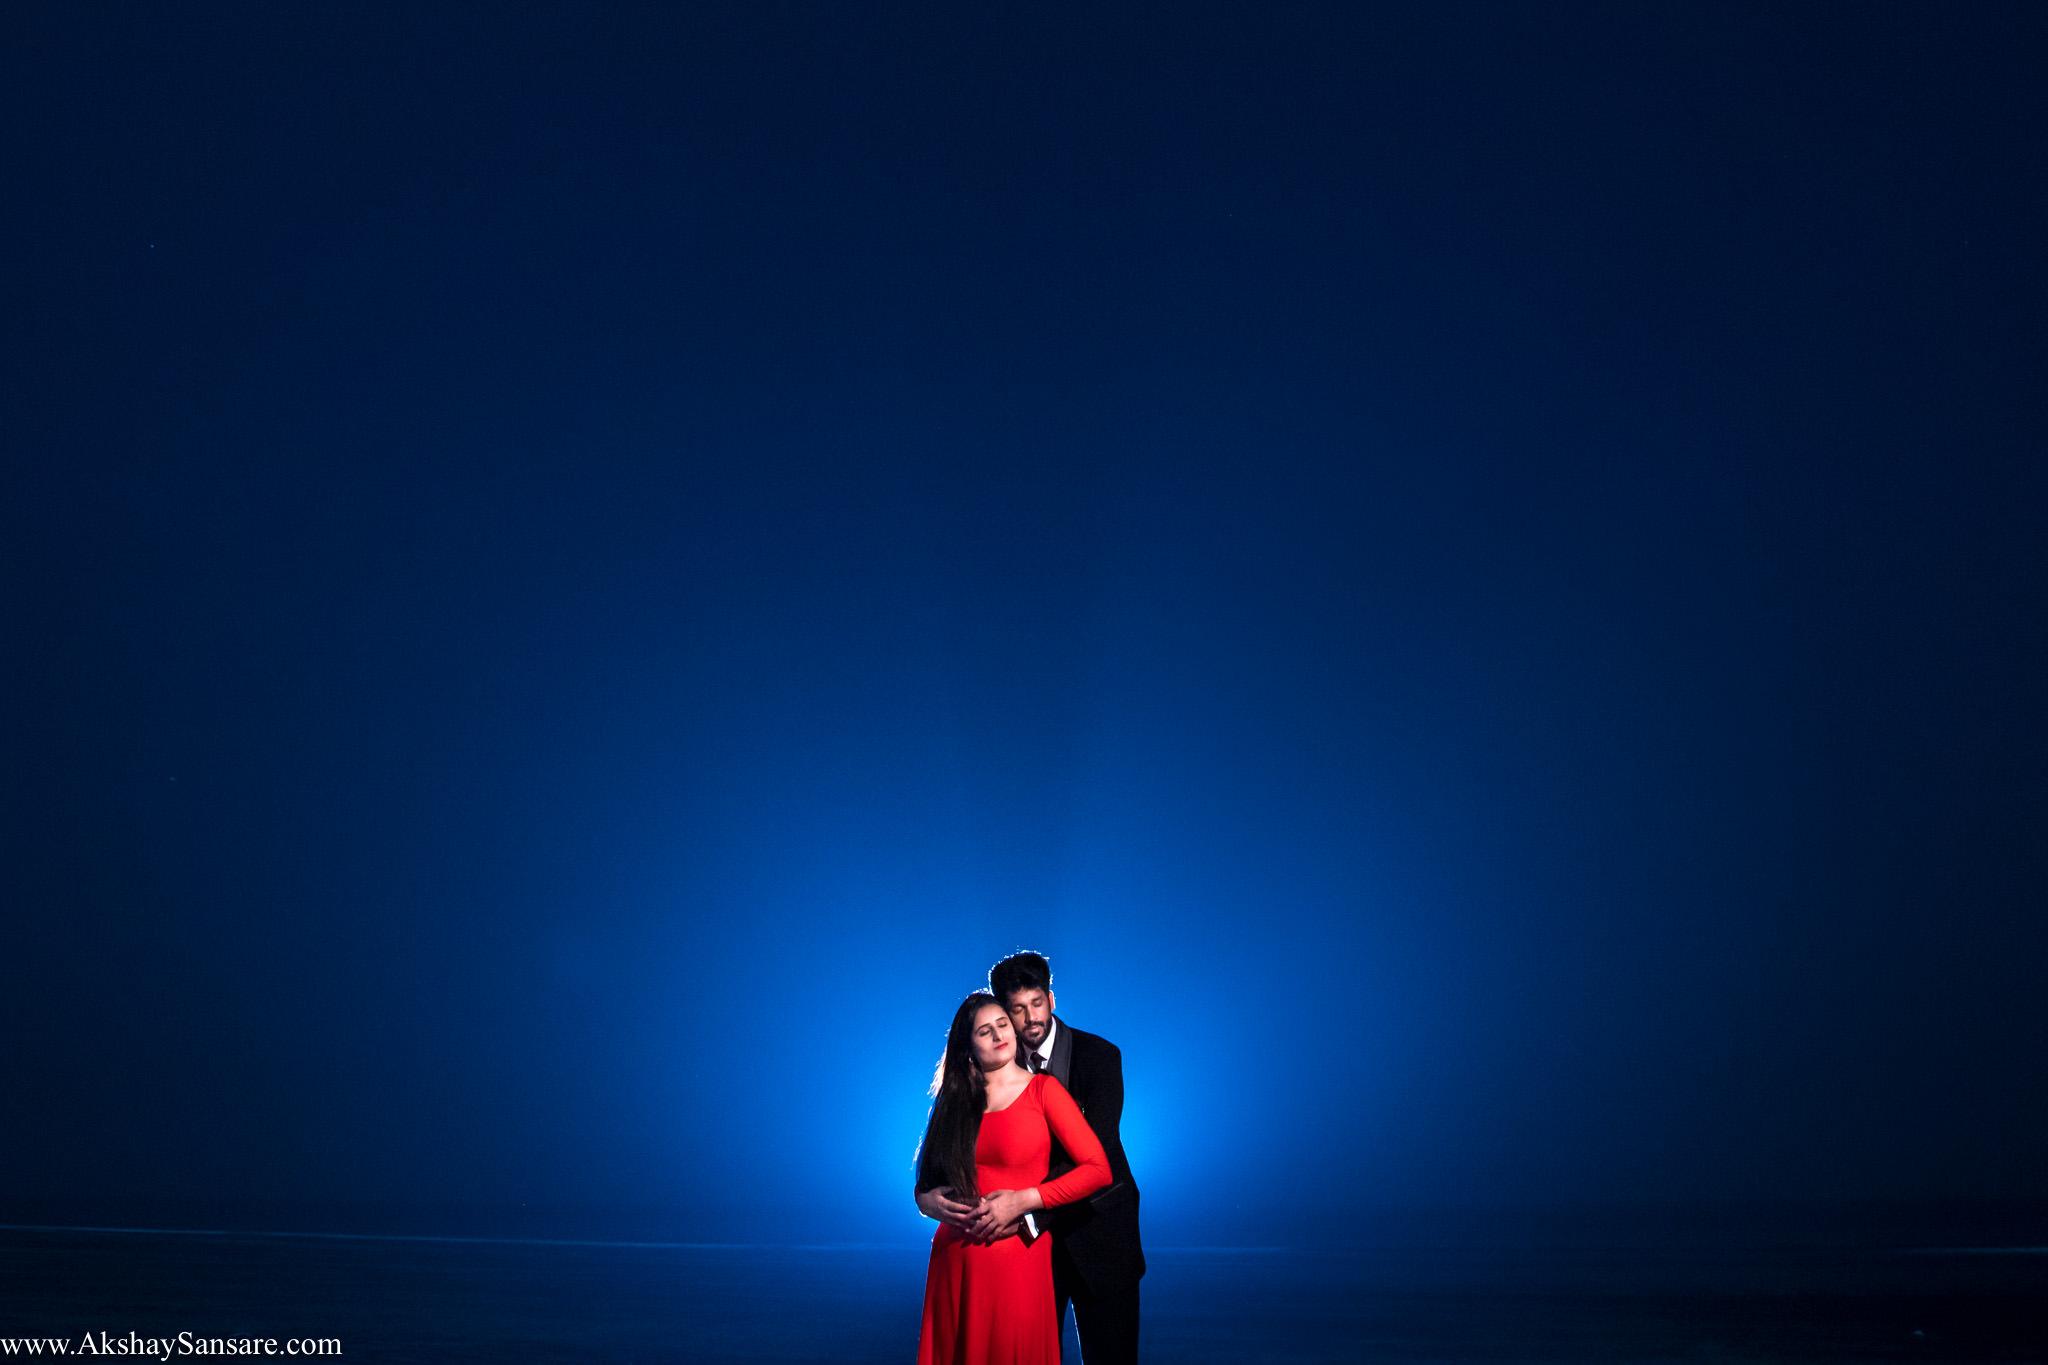 Priyanka x Sushank Pre-wedding Best Candid Photographer in Mumbai Akshay Sansare India(24).jpg